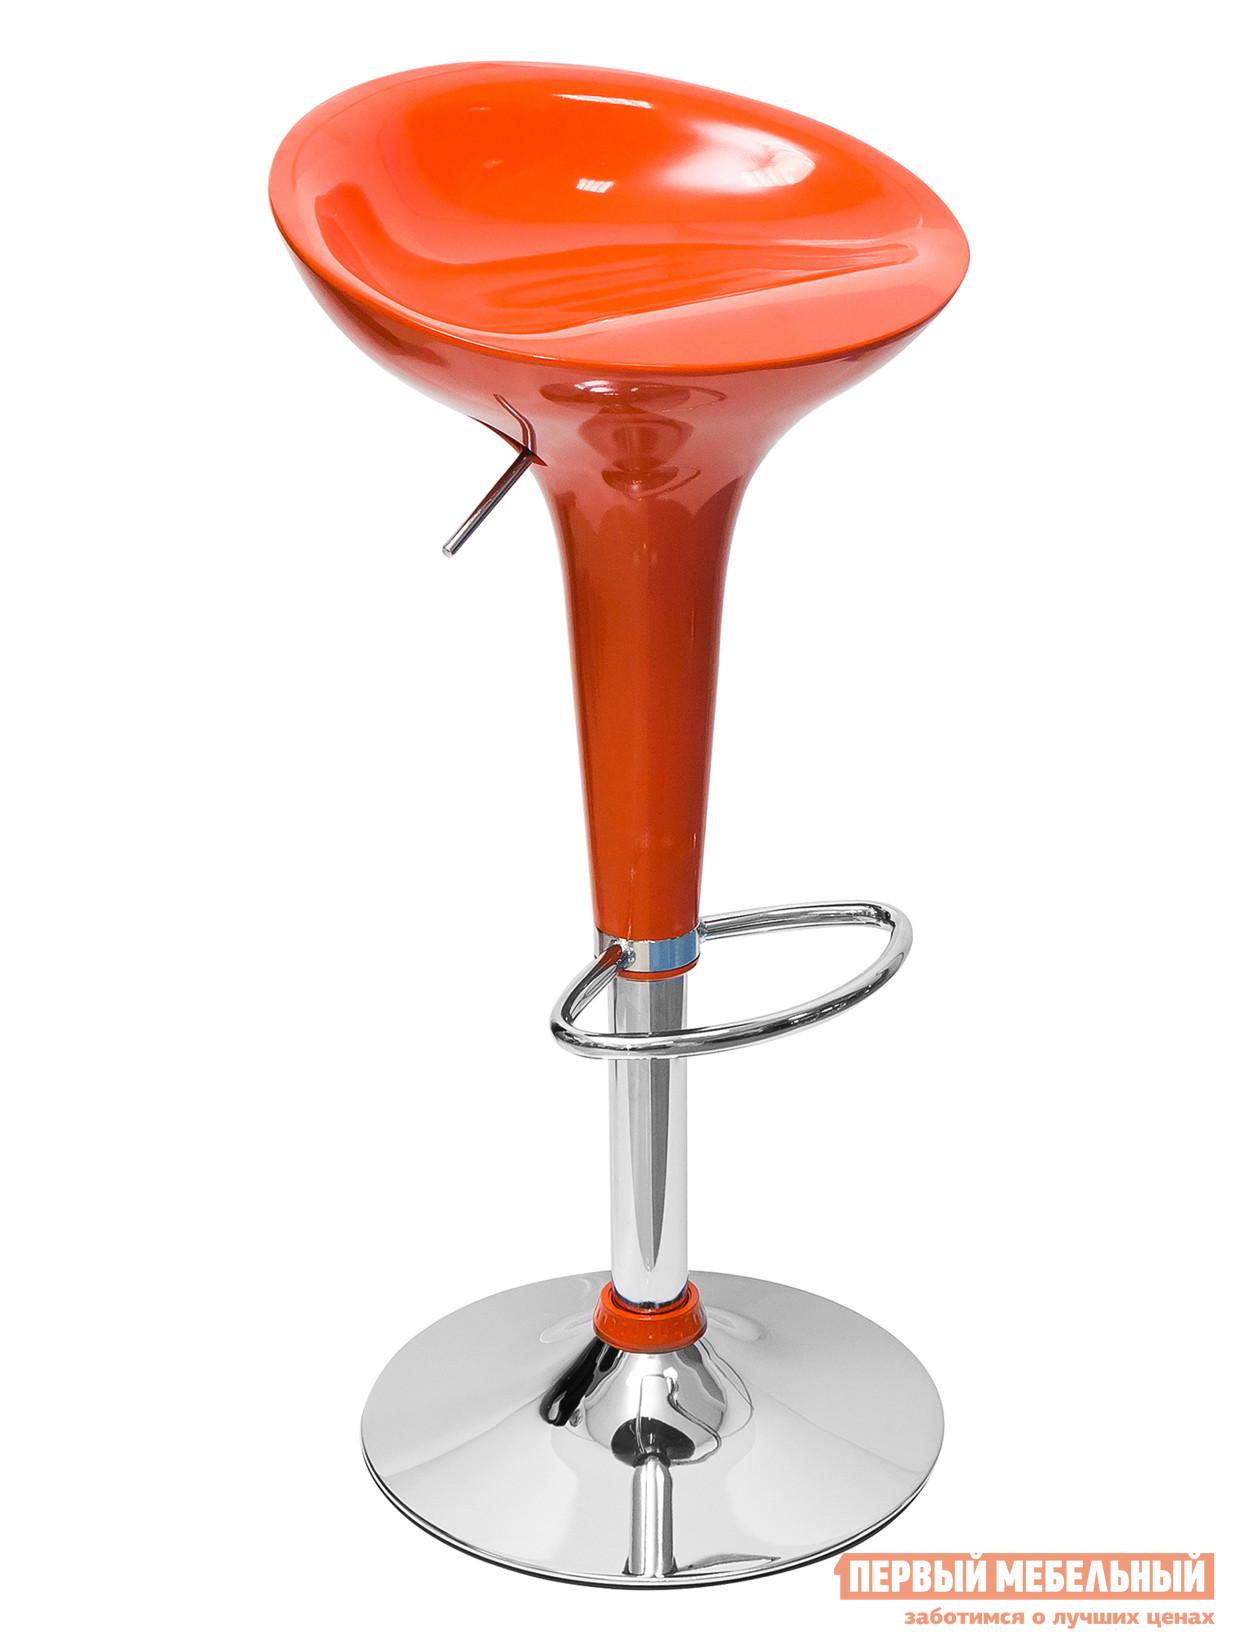 Барный стул STOOL GROUP Бомба Оранжевый от Купистол